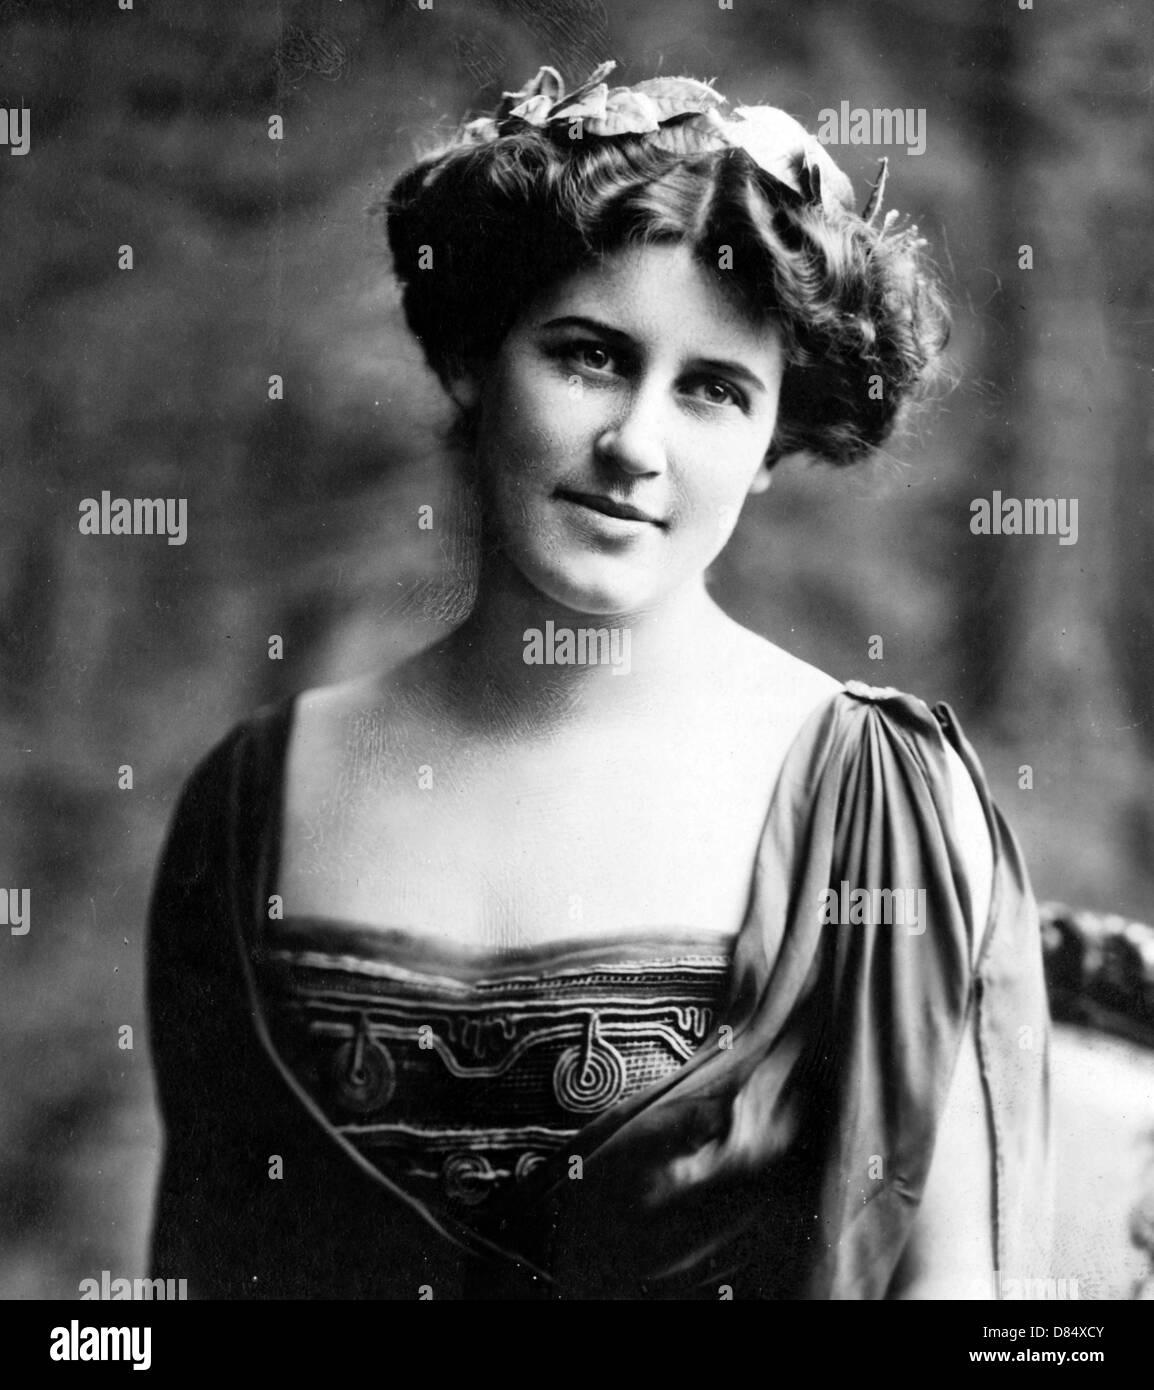 Suffragette Inez Milholland Boissevain Imagen De Stock